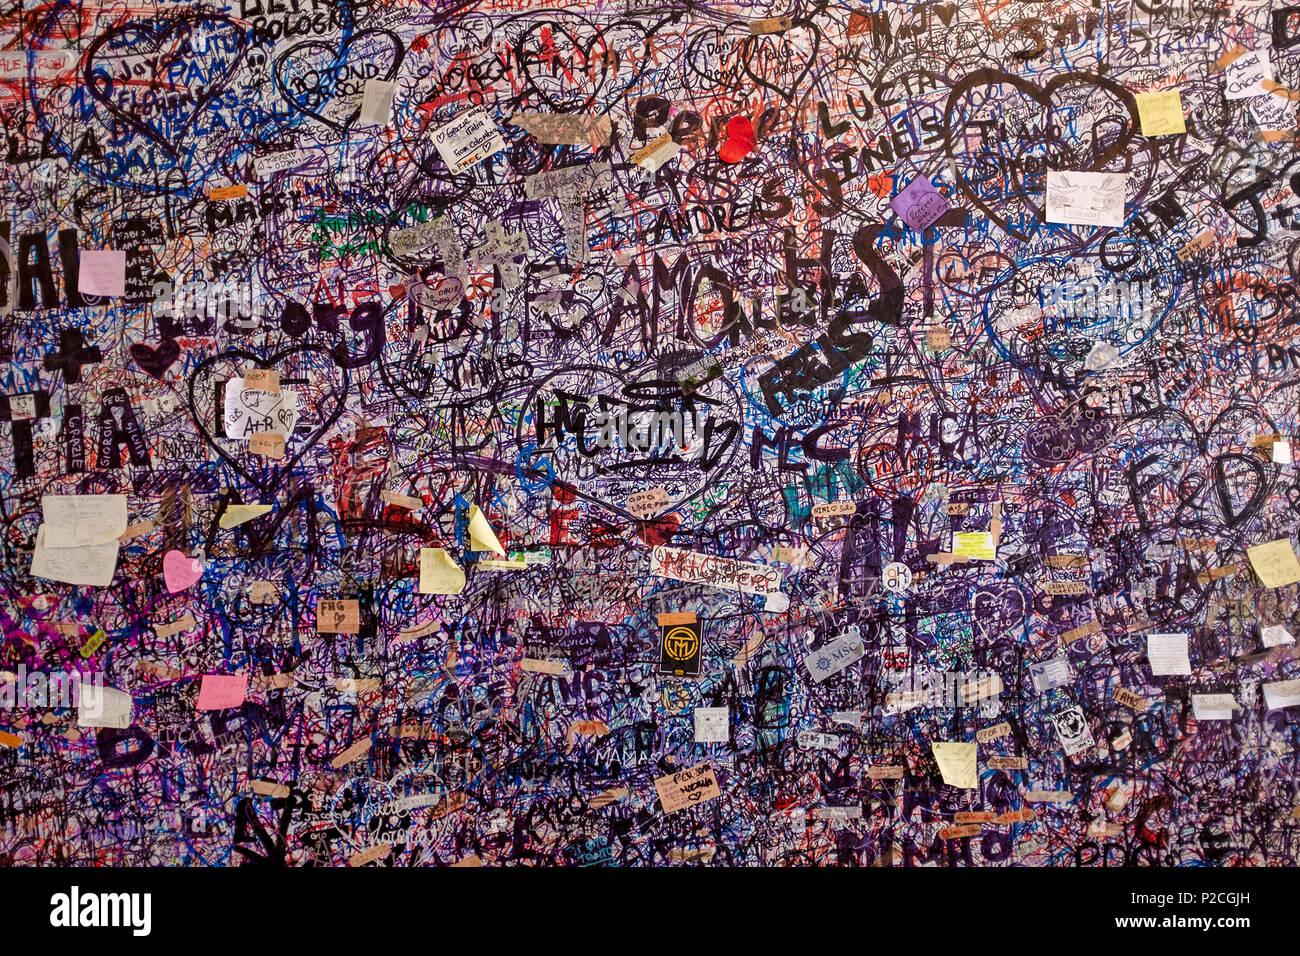 Vandalism over the walls of Juliet's House, Verona, Italy - Stock Image